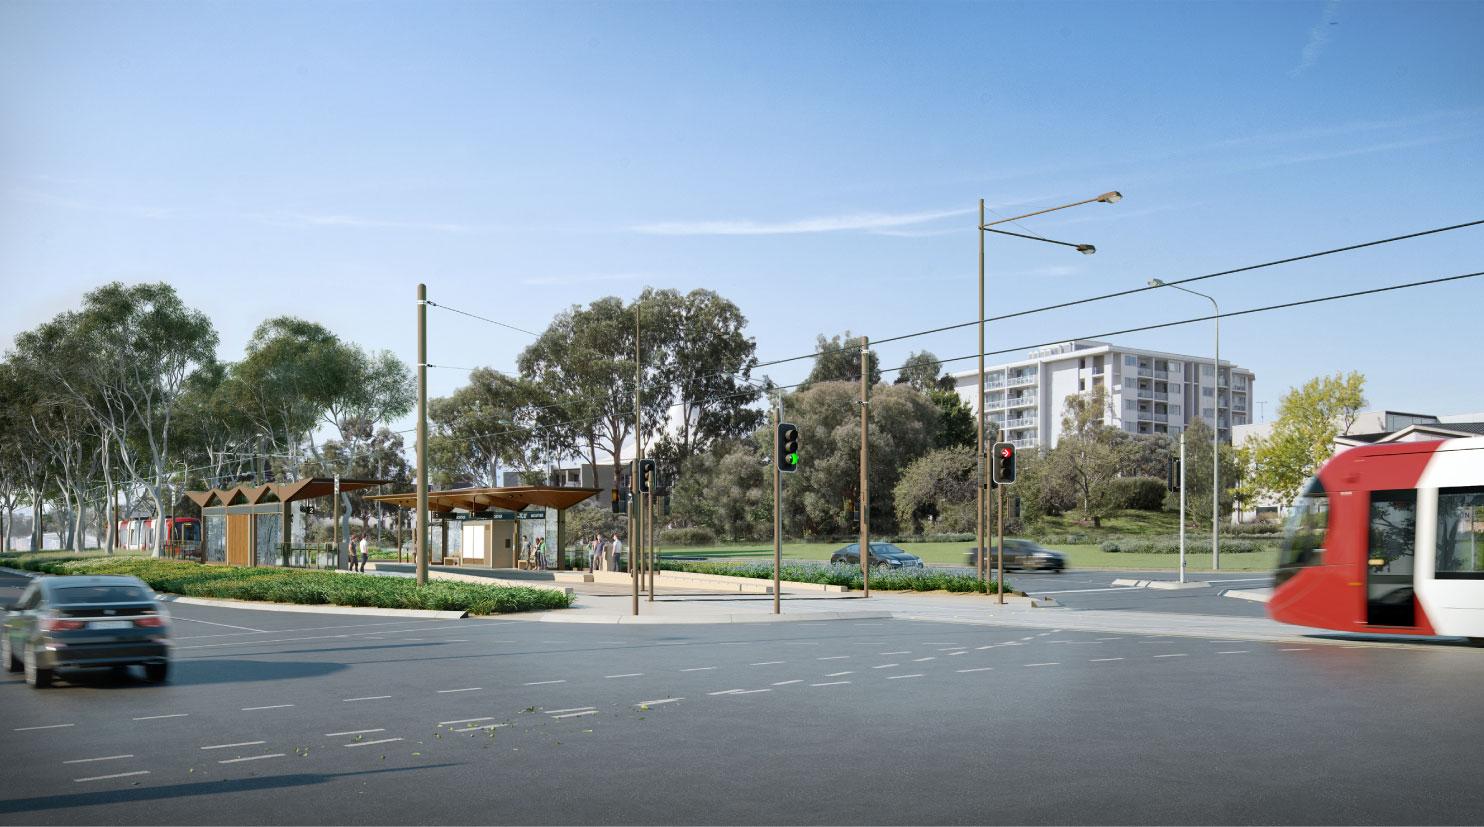 Studio-Colin-Polwarth-Canberra-Light-Rail (8).jpg